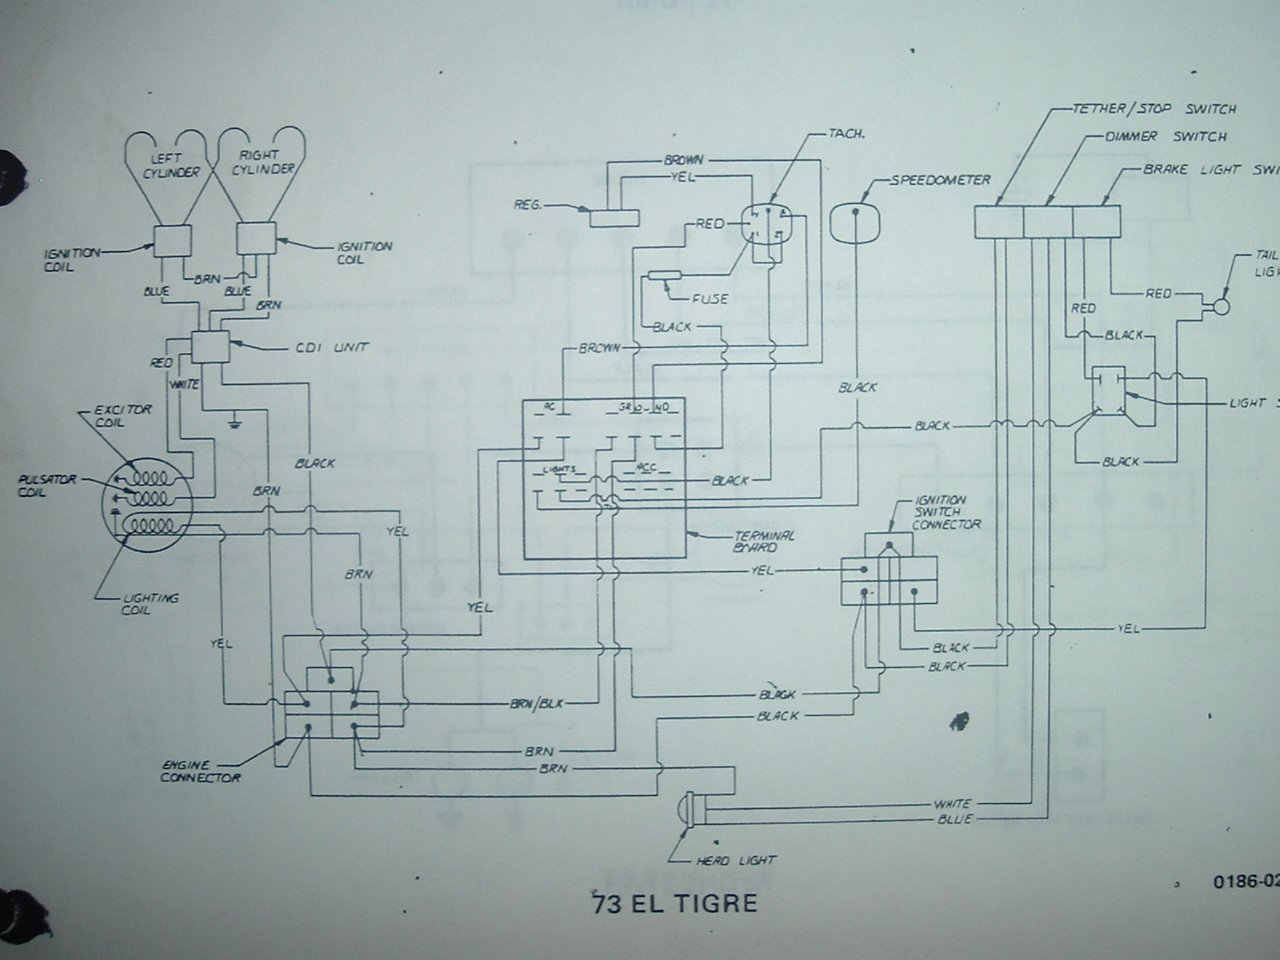 hight resolution of 73 cheetah wiring diagram wiring diagram blog 73 cheetah wiring diagram